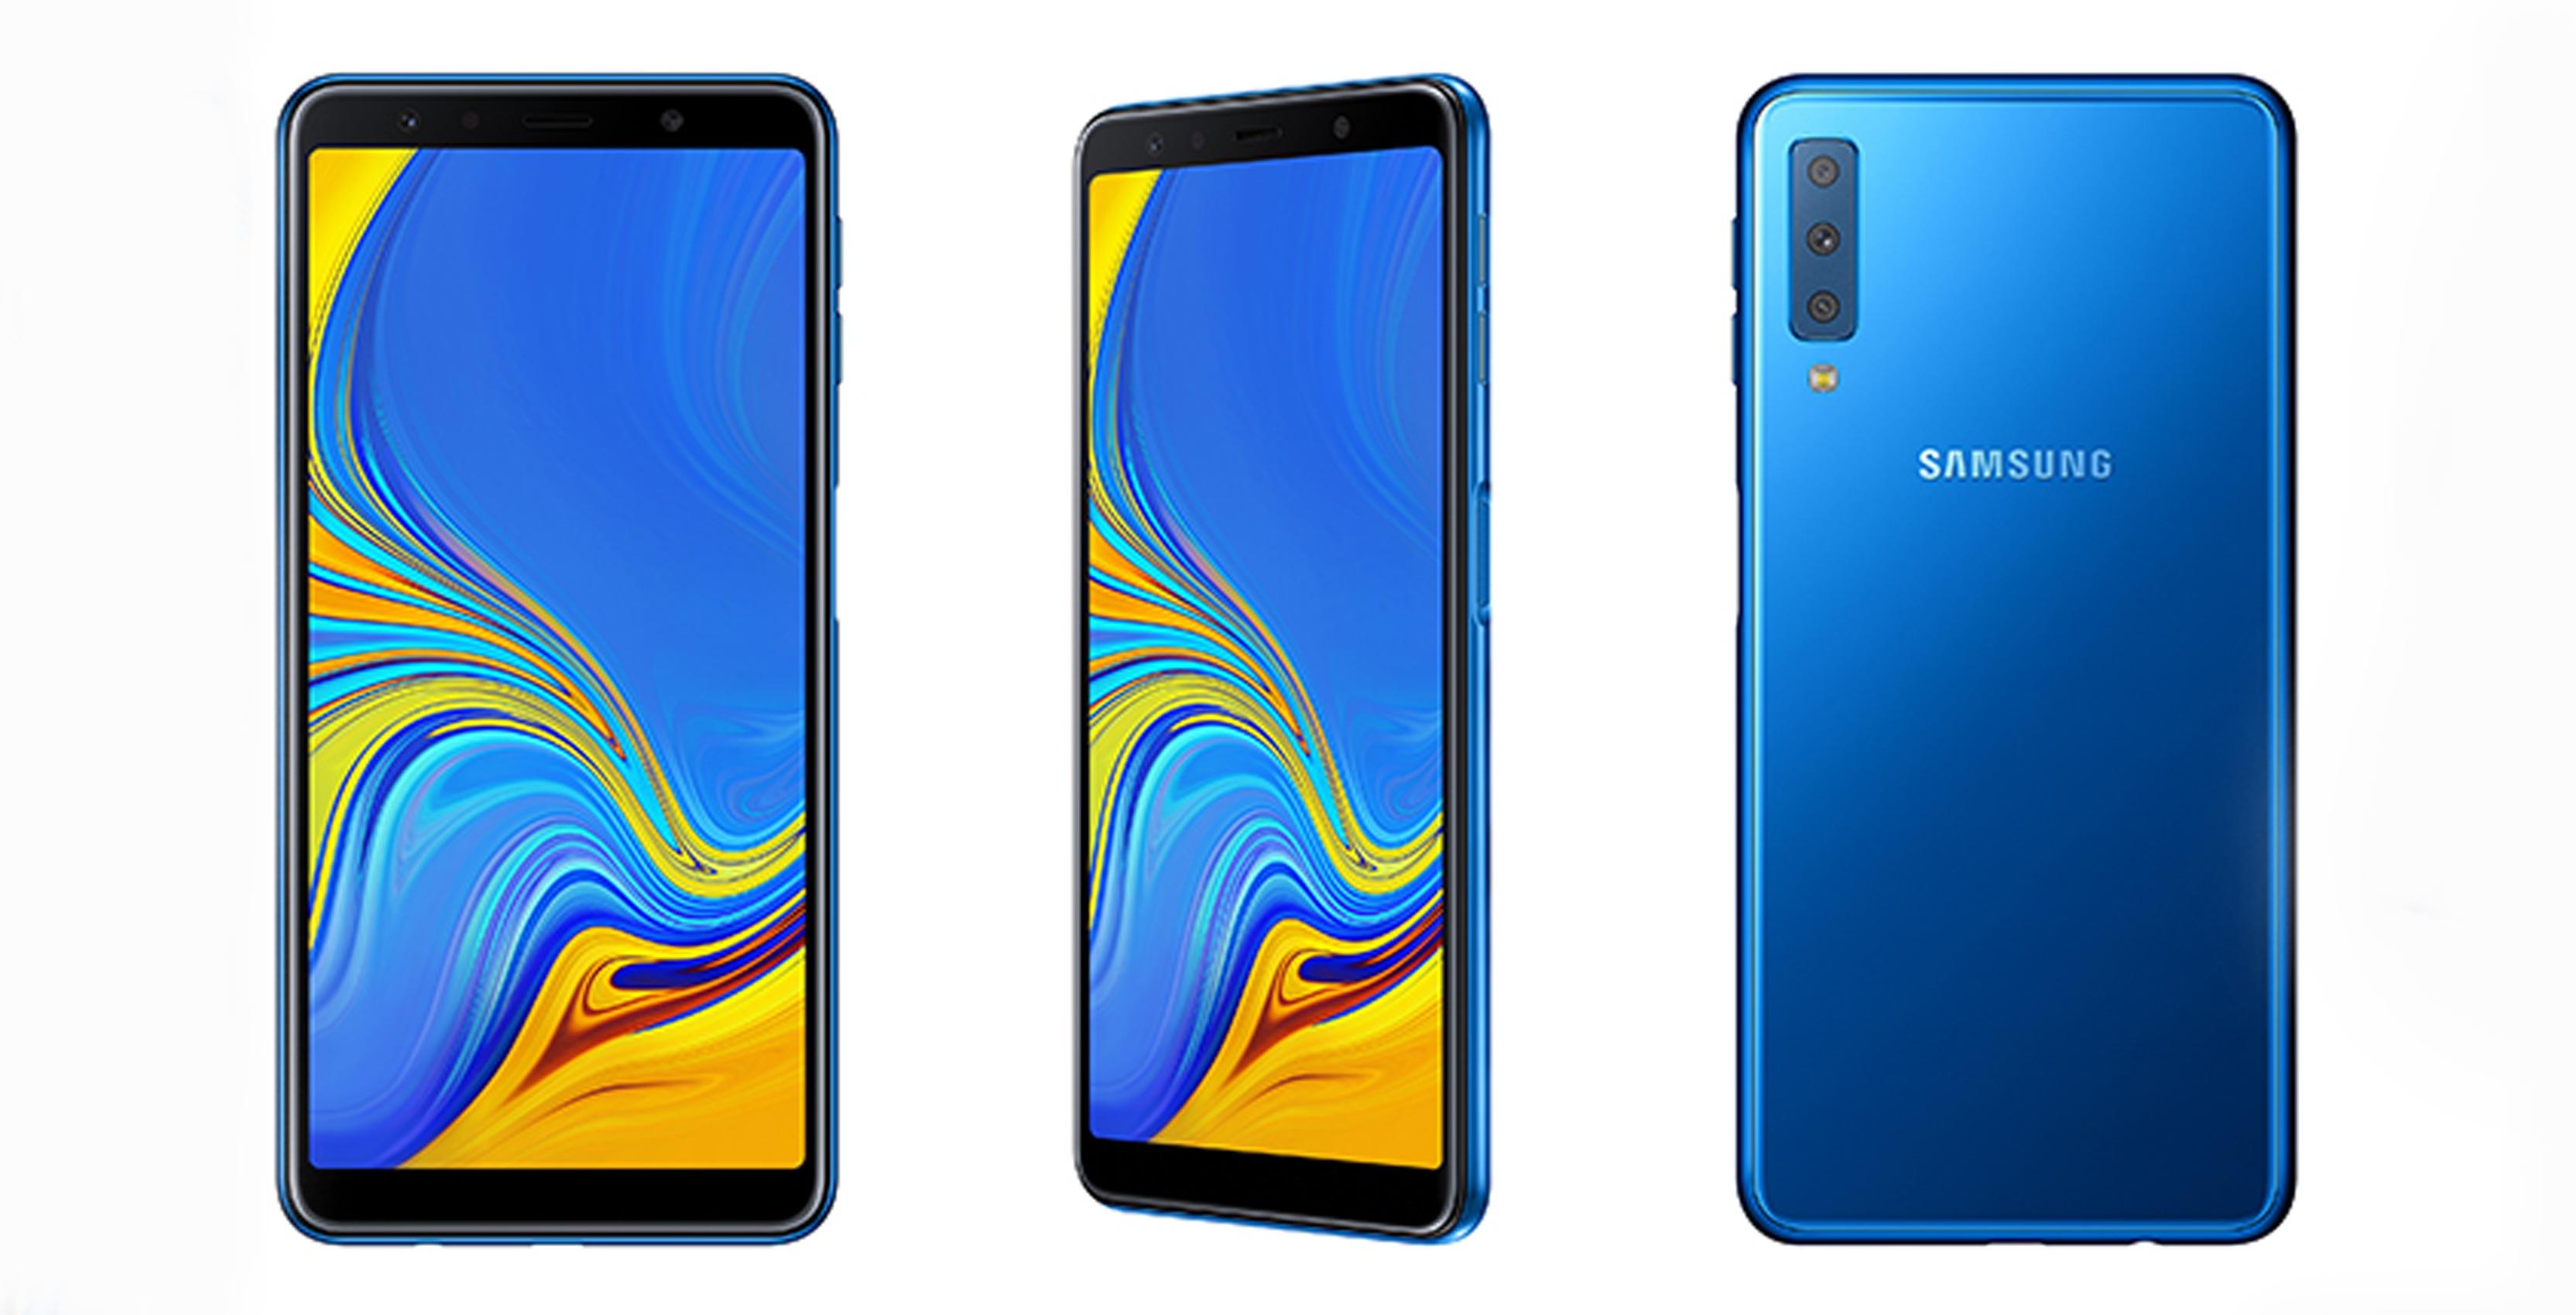 Samsung's new Galaxy A7 midrange smartphone